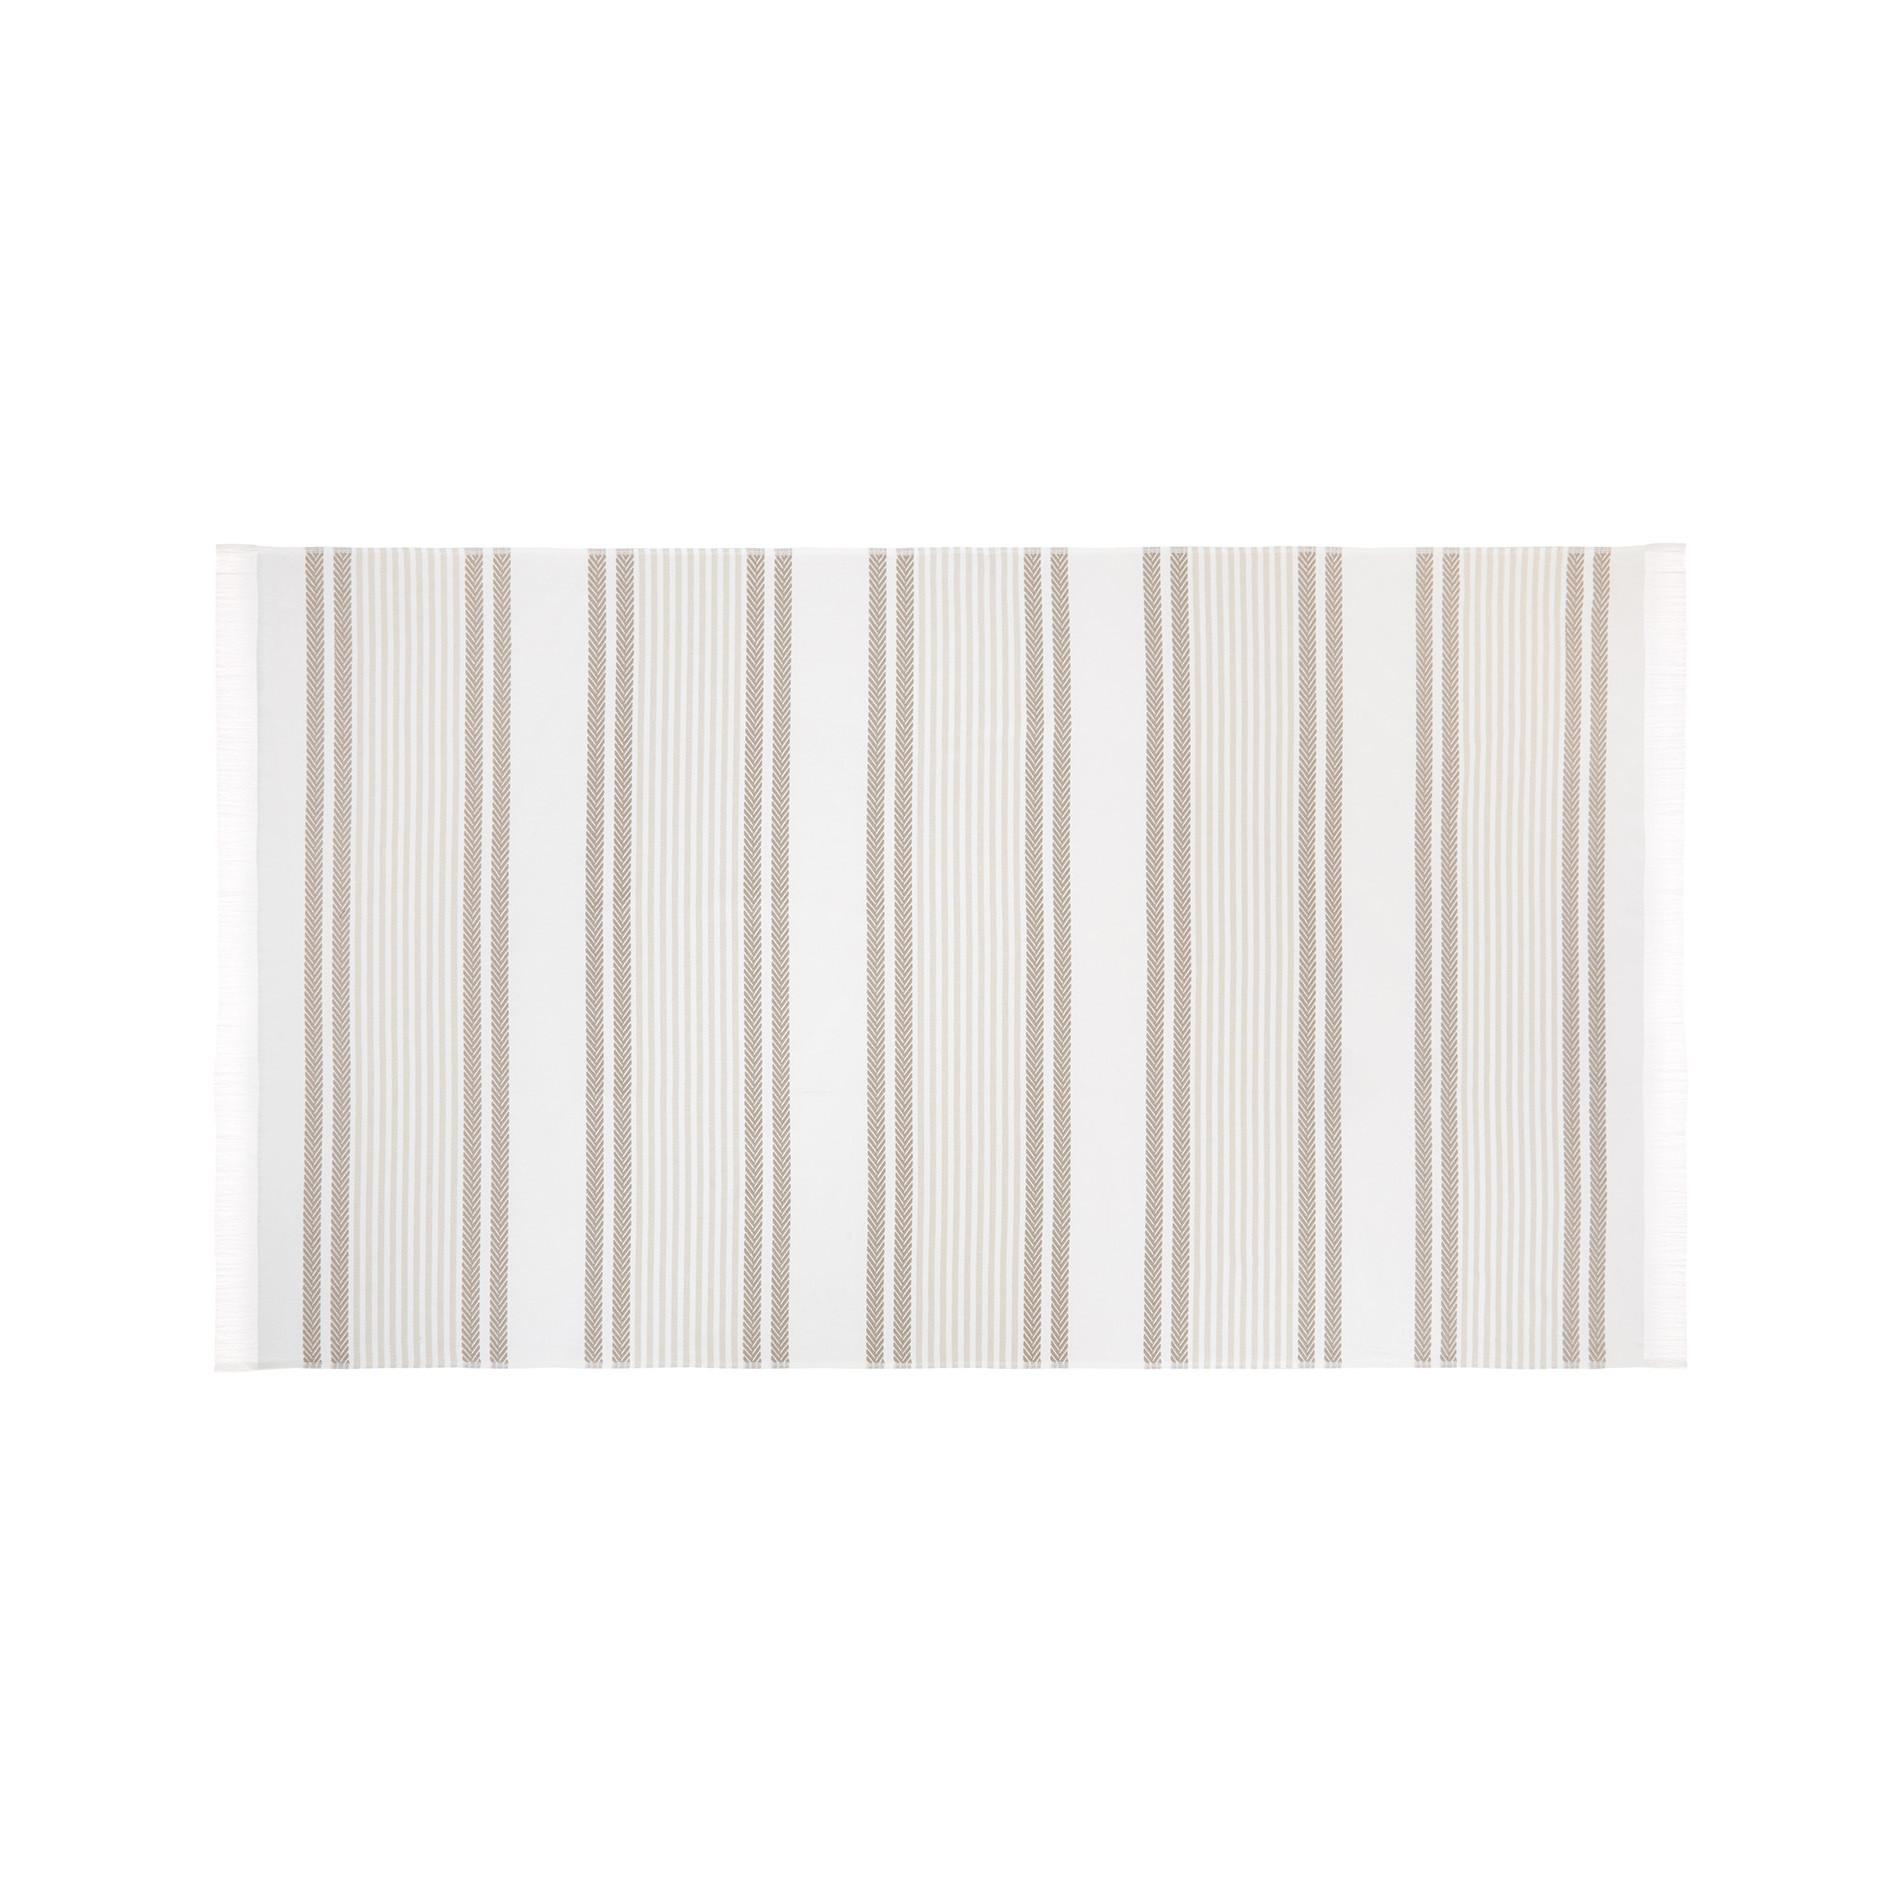 Telo mare hammam cotone jacquard tinto filo a righe, Bianco, large image number 0